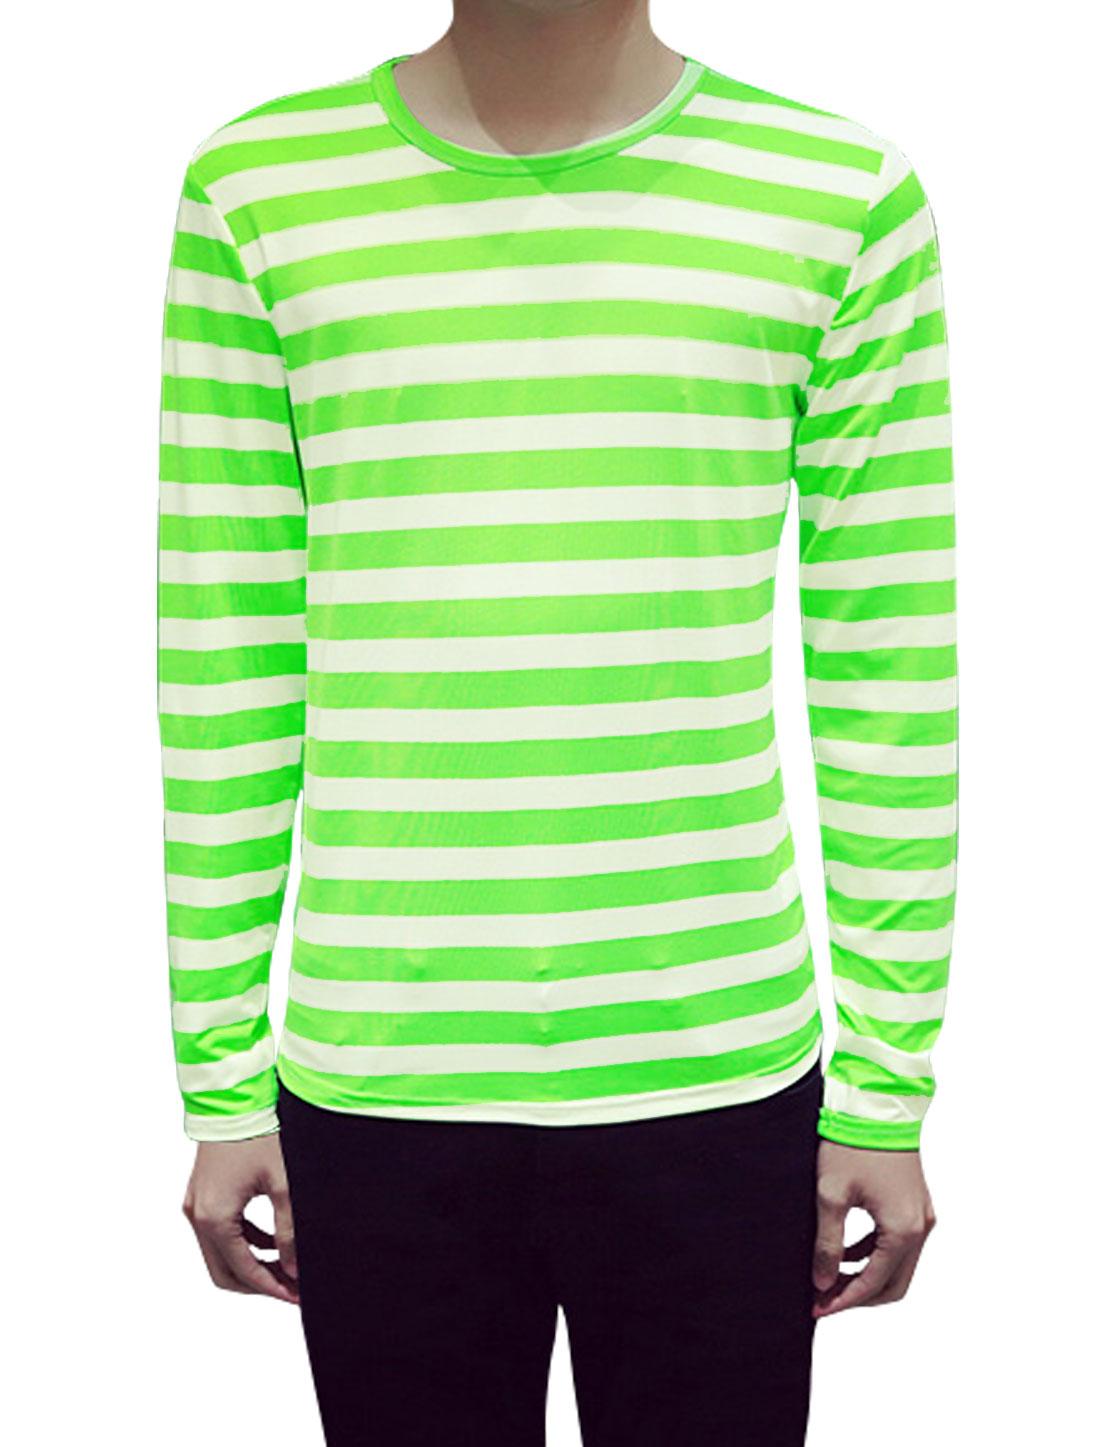 Men Long Sleeves Round Neck Stripes Slim Fit Tee Shirt Green L